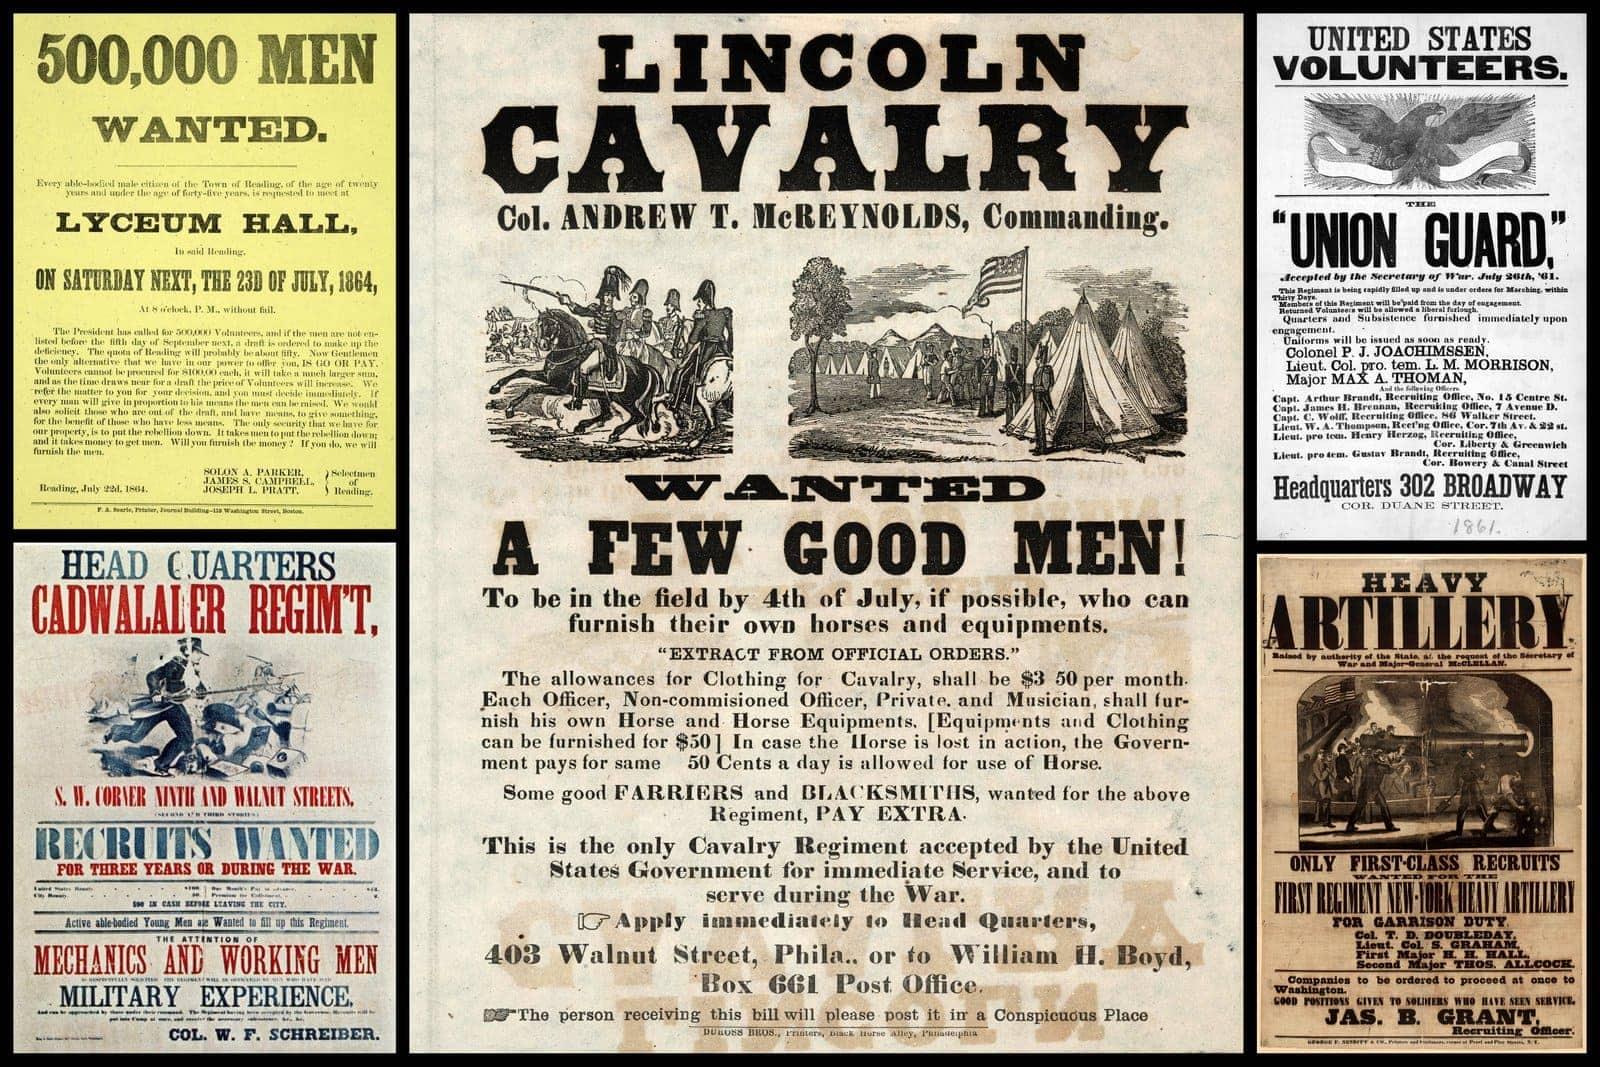 Civil War recruitment posters and broadsides